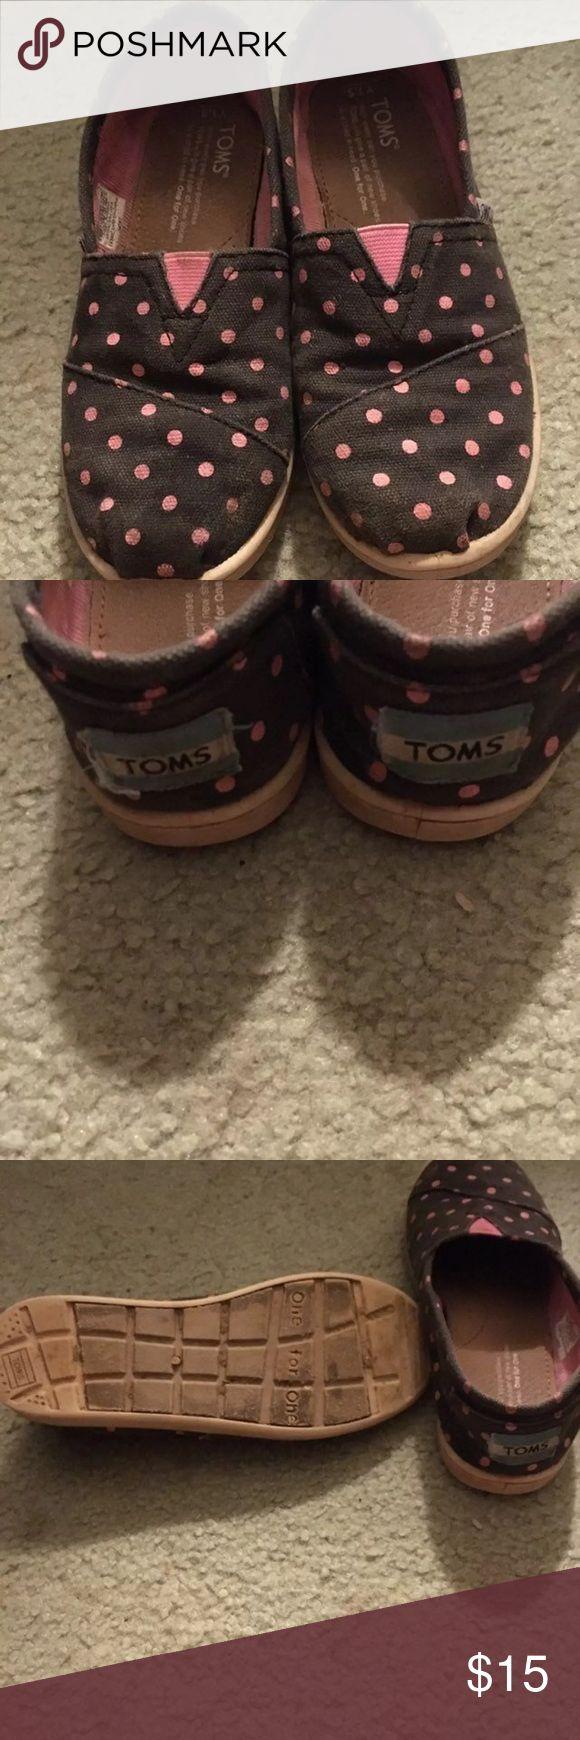 Tom's For Girls Size 1 1/2 Tom's For Girls Size 1 1/2 Blue with pink polka dots  GUC Pet friendly smoke free home Toms Shoes Moccasins